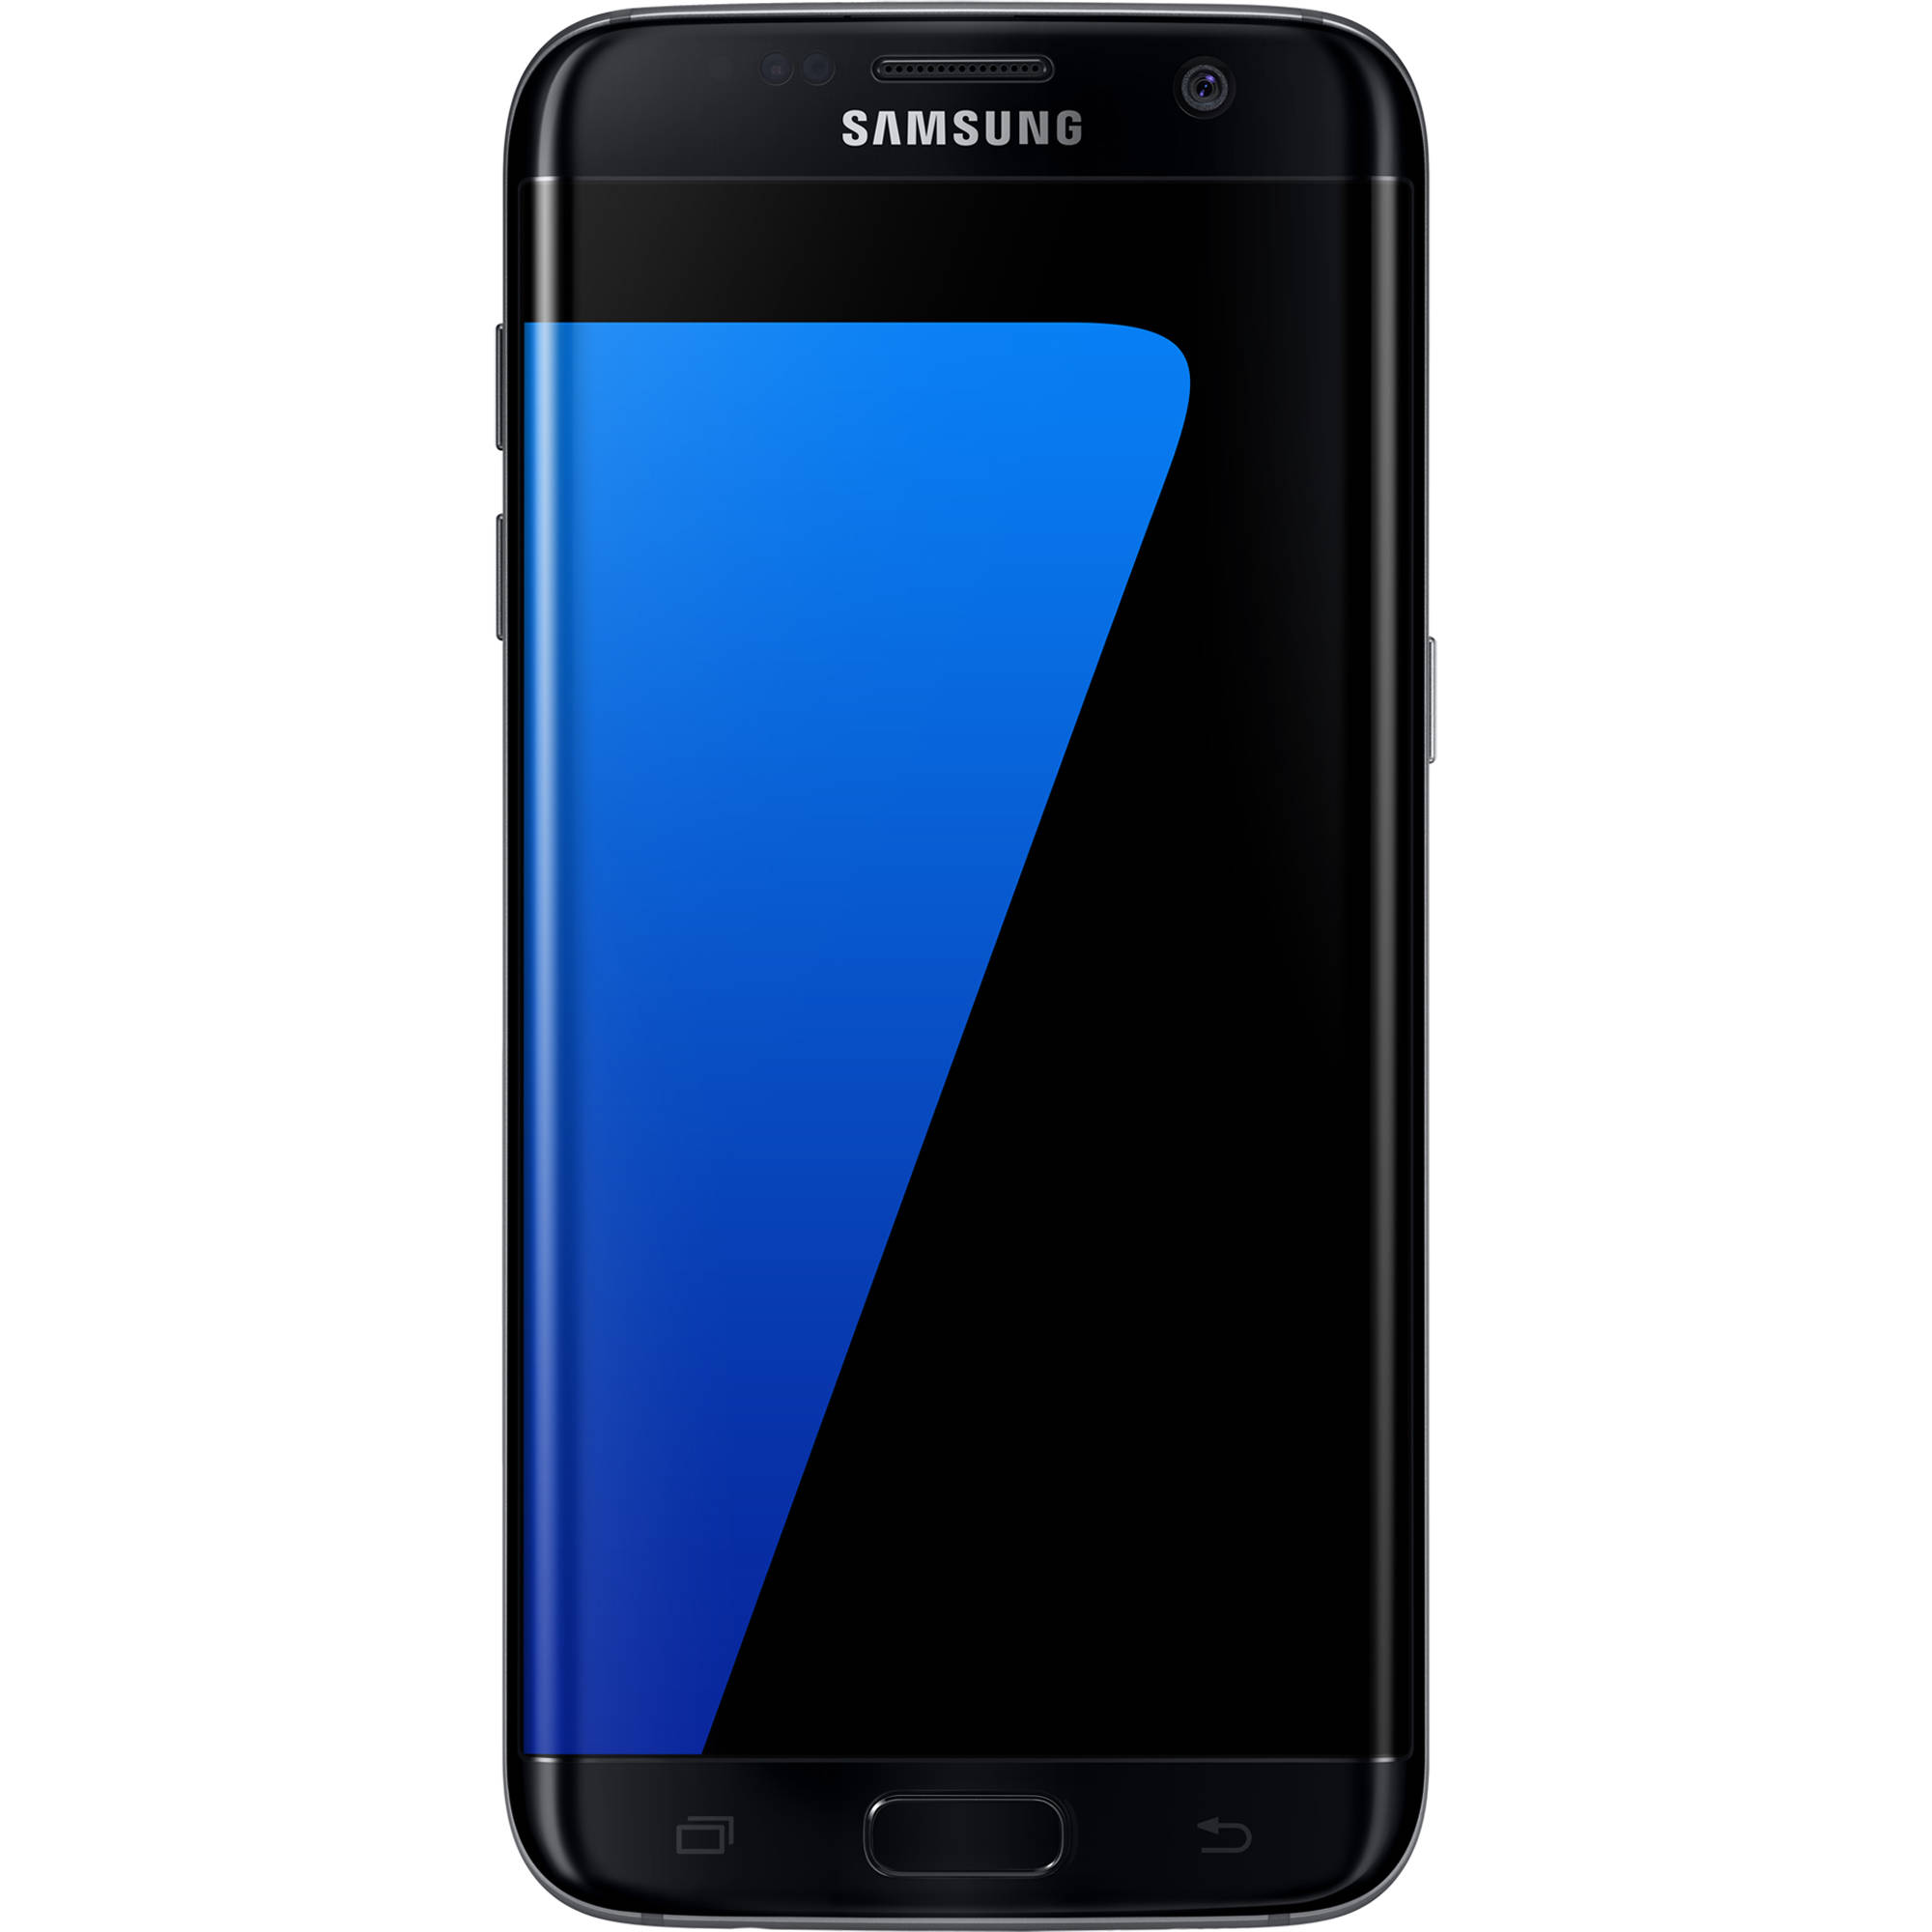 Samsung Galaxy S7 edge SM-G935F 32GB Smartphone (Unlocked, Black)